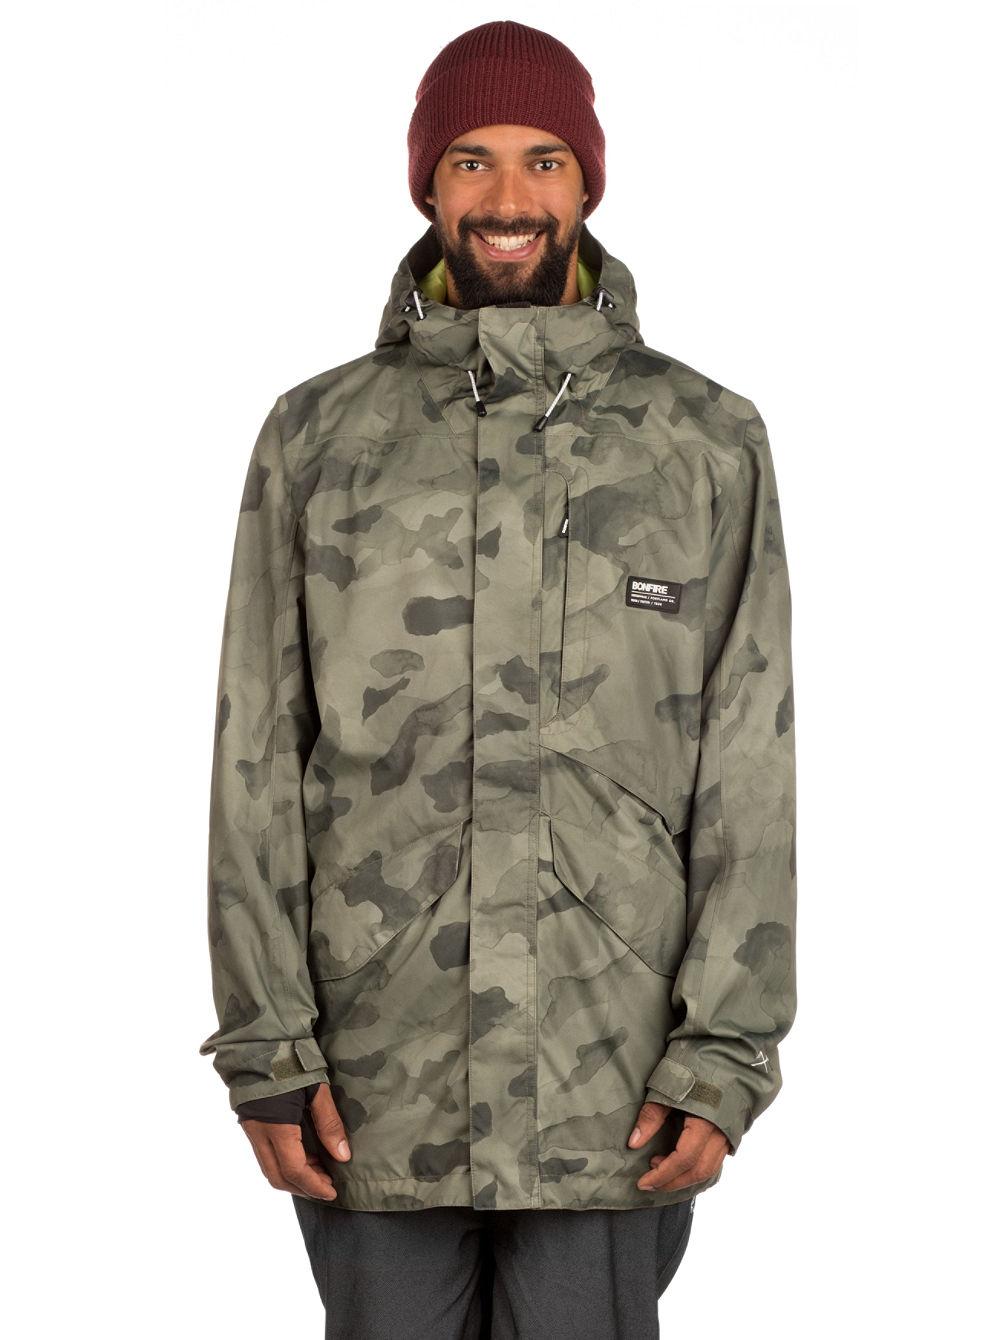 5f95ad4848cf3 Buy Bonfire Vector Jacket online at Blue Tomato